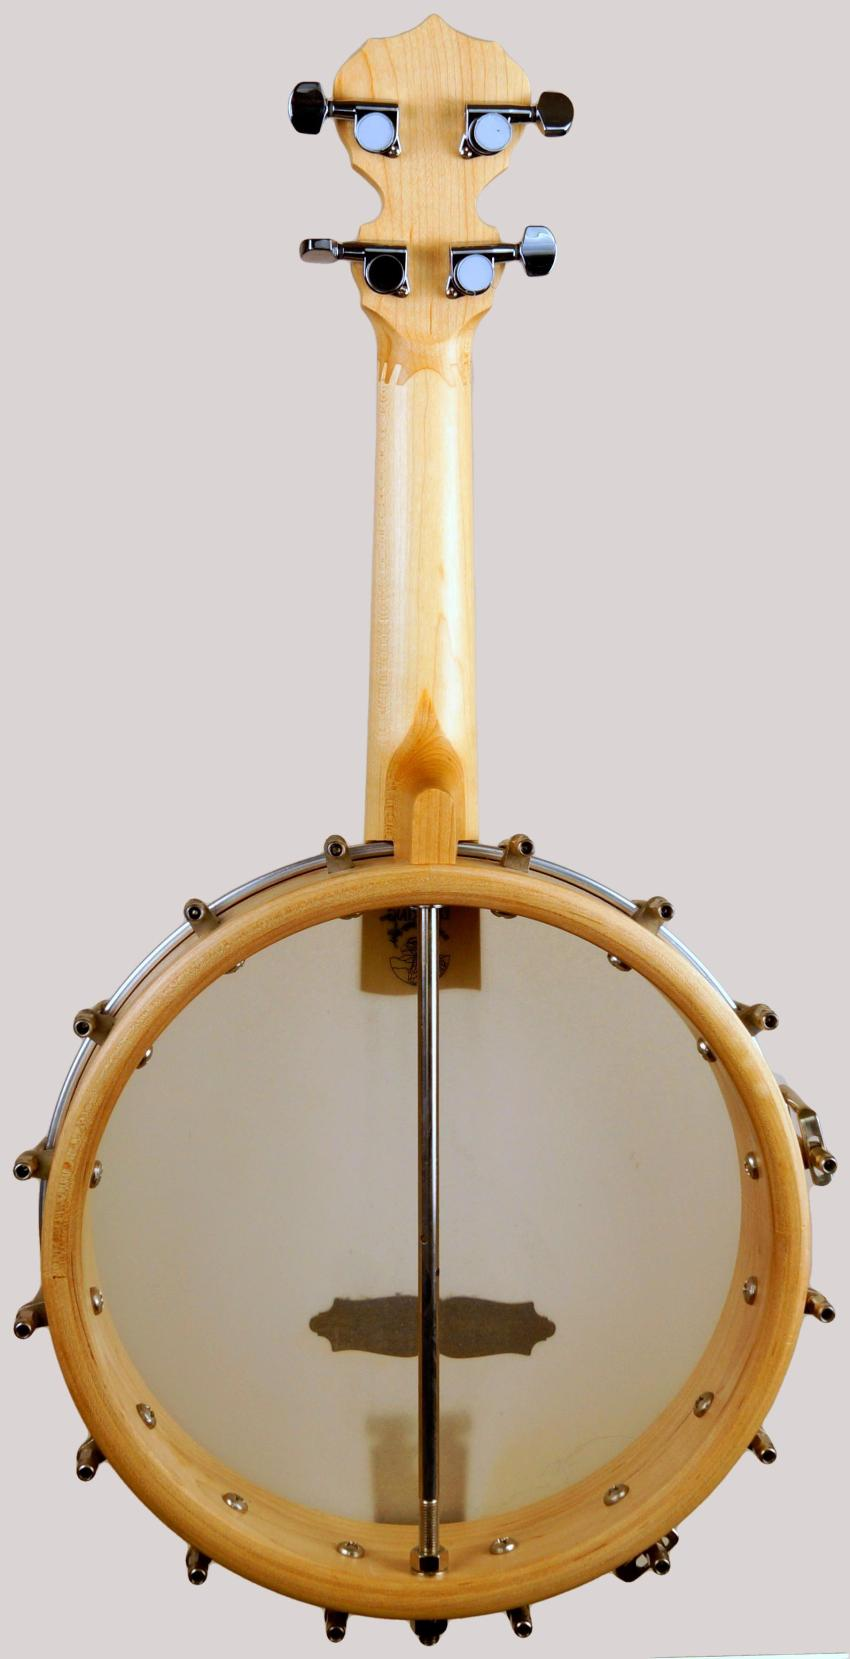 Deering Goodtime Concert Banjolele with an 11 inch drum